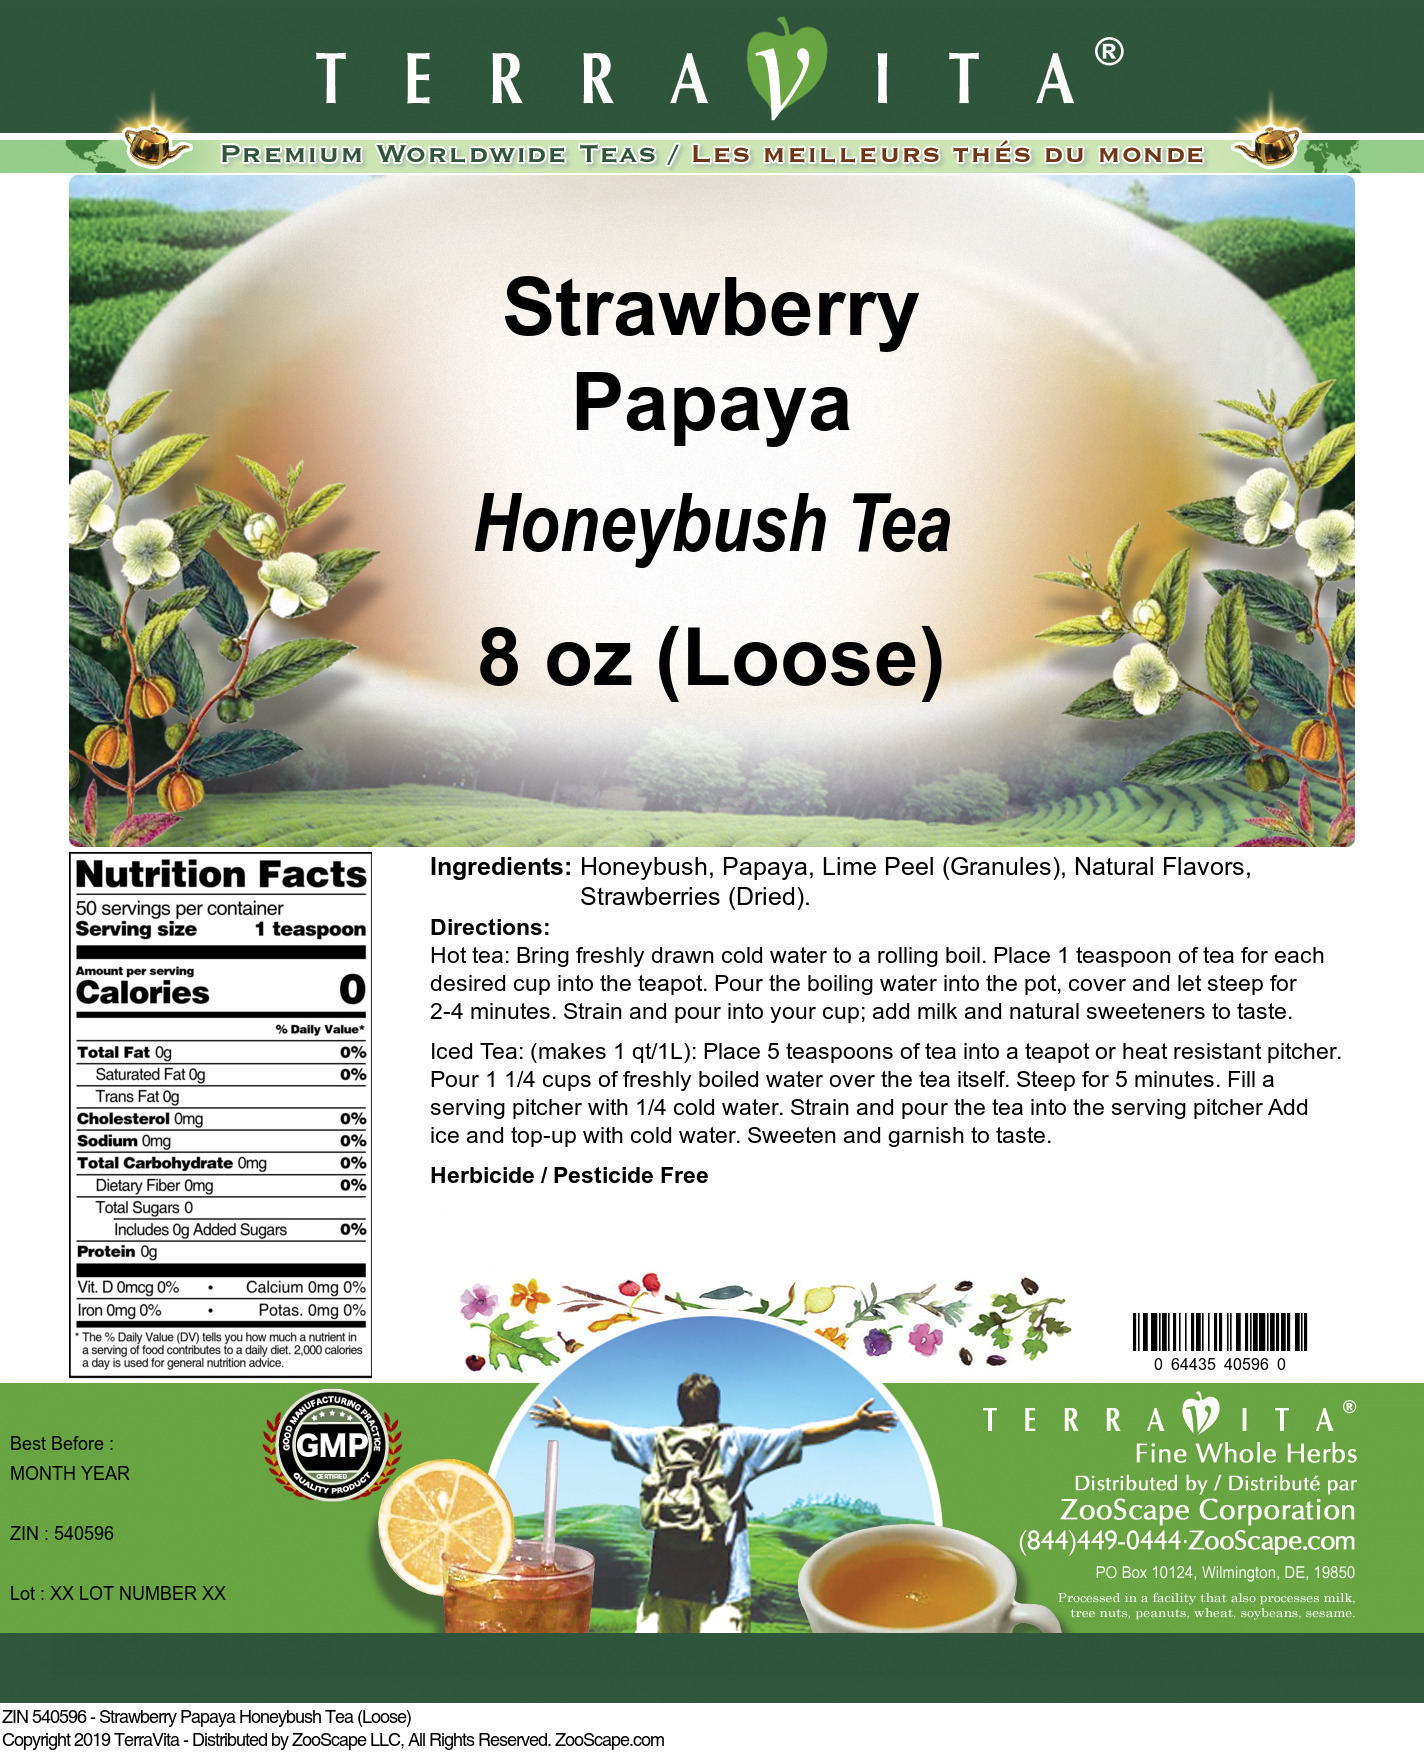 Strawberry Papaya Honeybush Tea